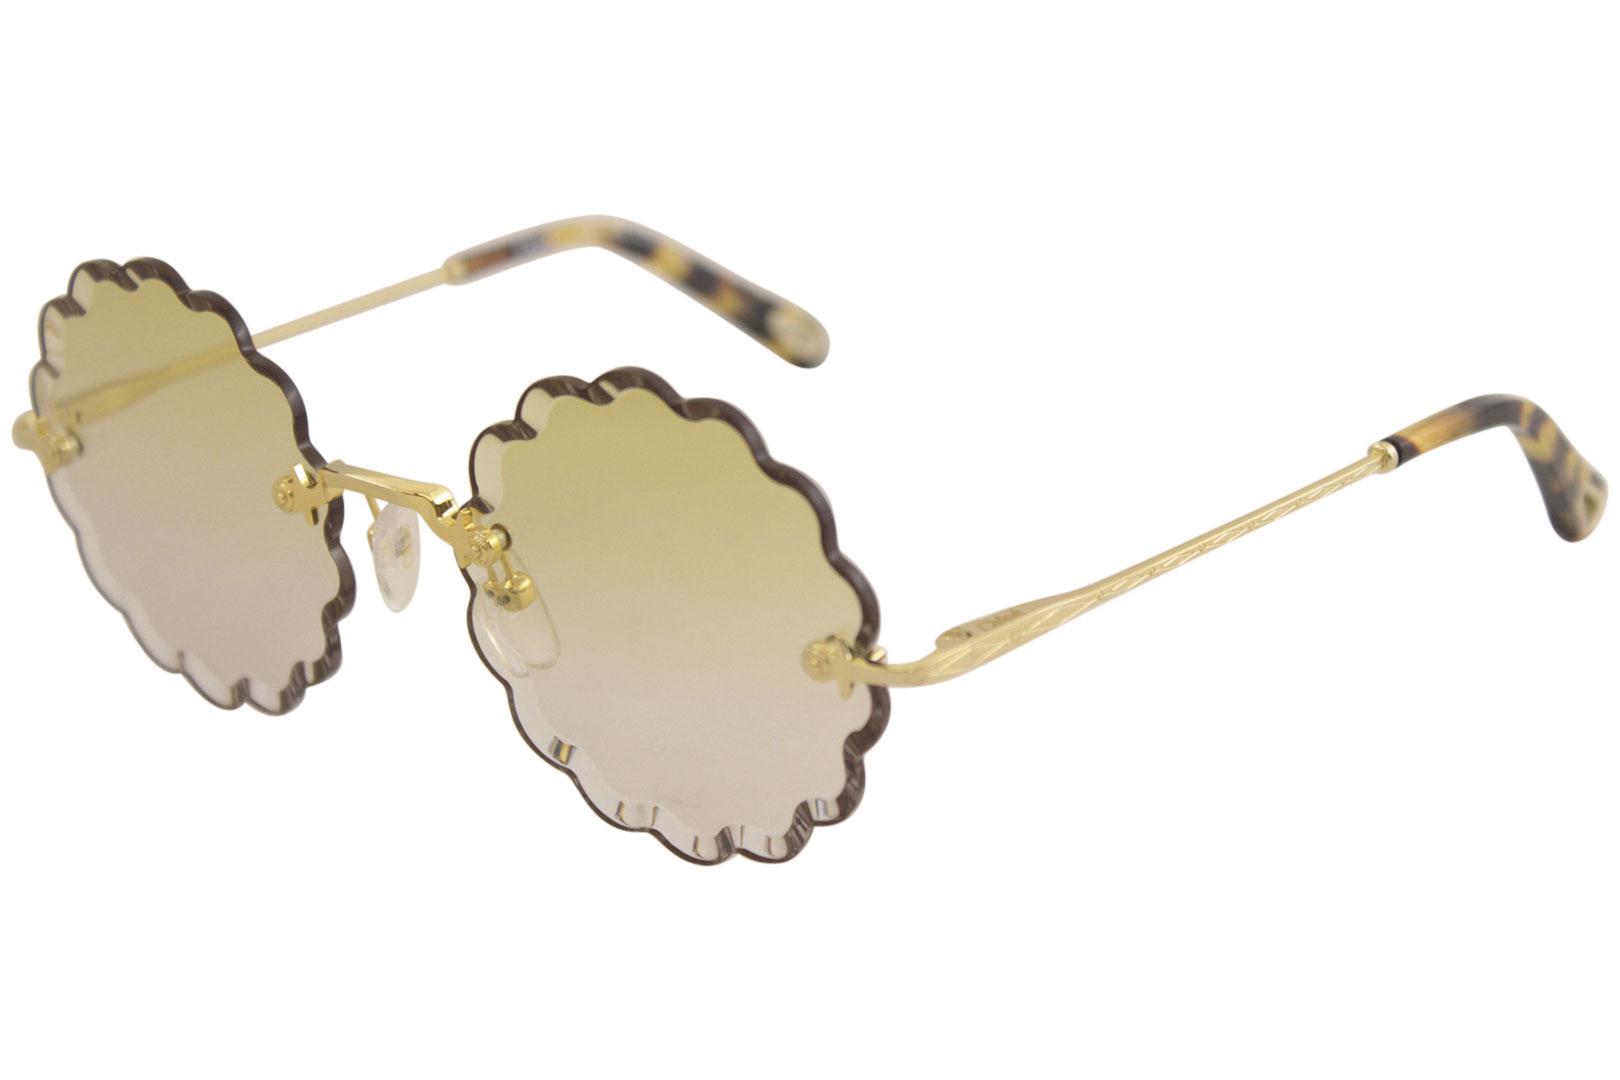 9c366dba83d Chloe Women s CE142S CE 142 S 826 Gold Fashion Round Sunglasses 53mm ...